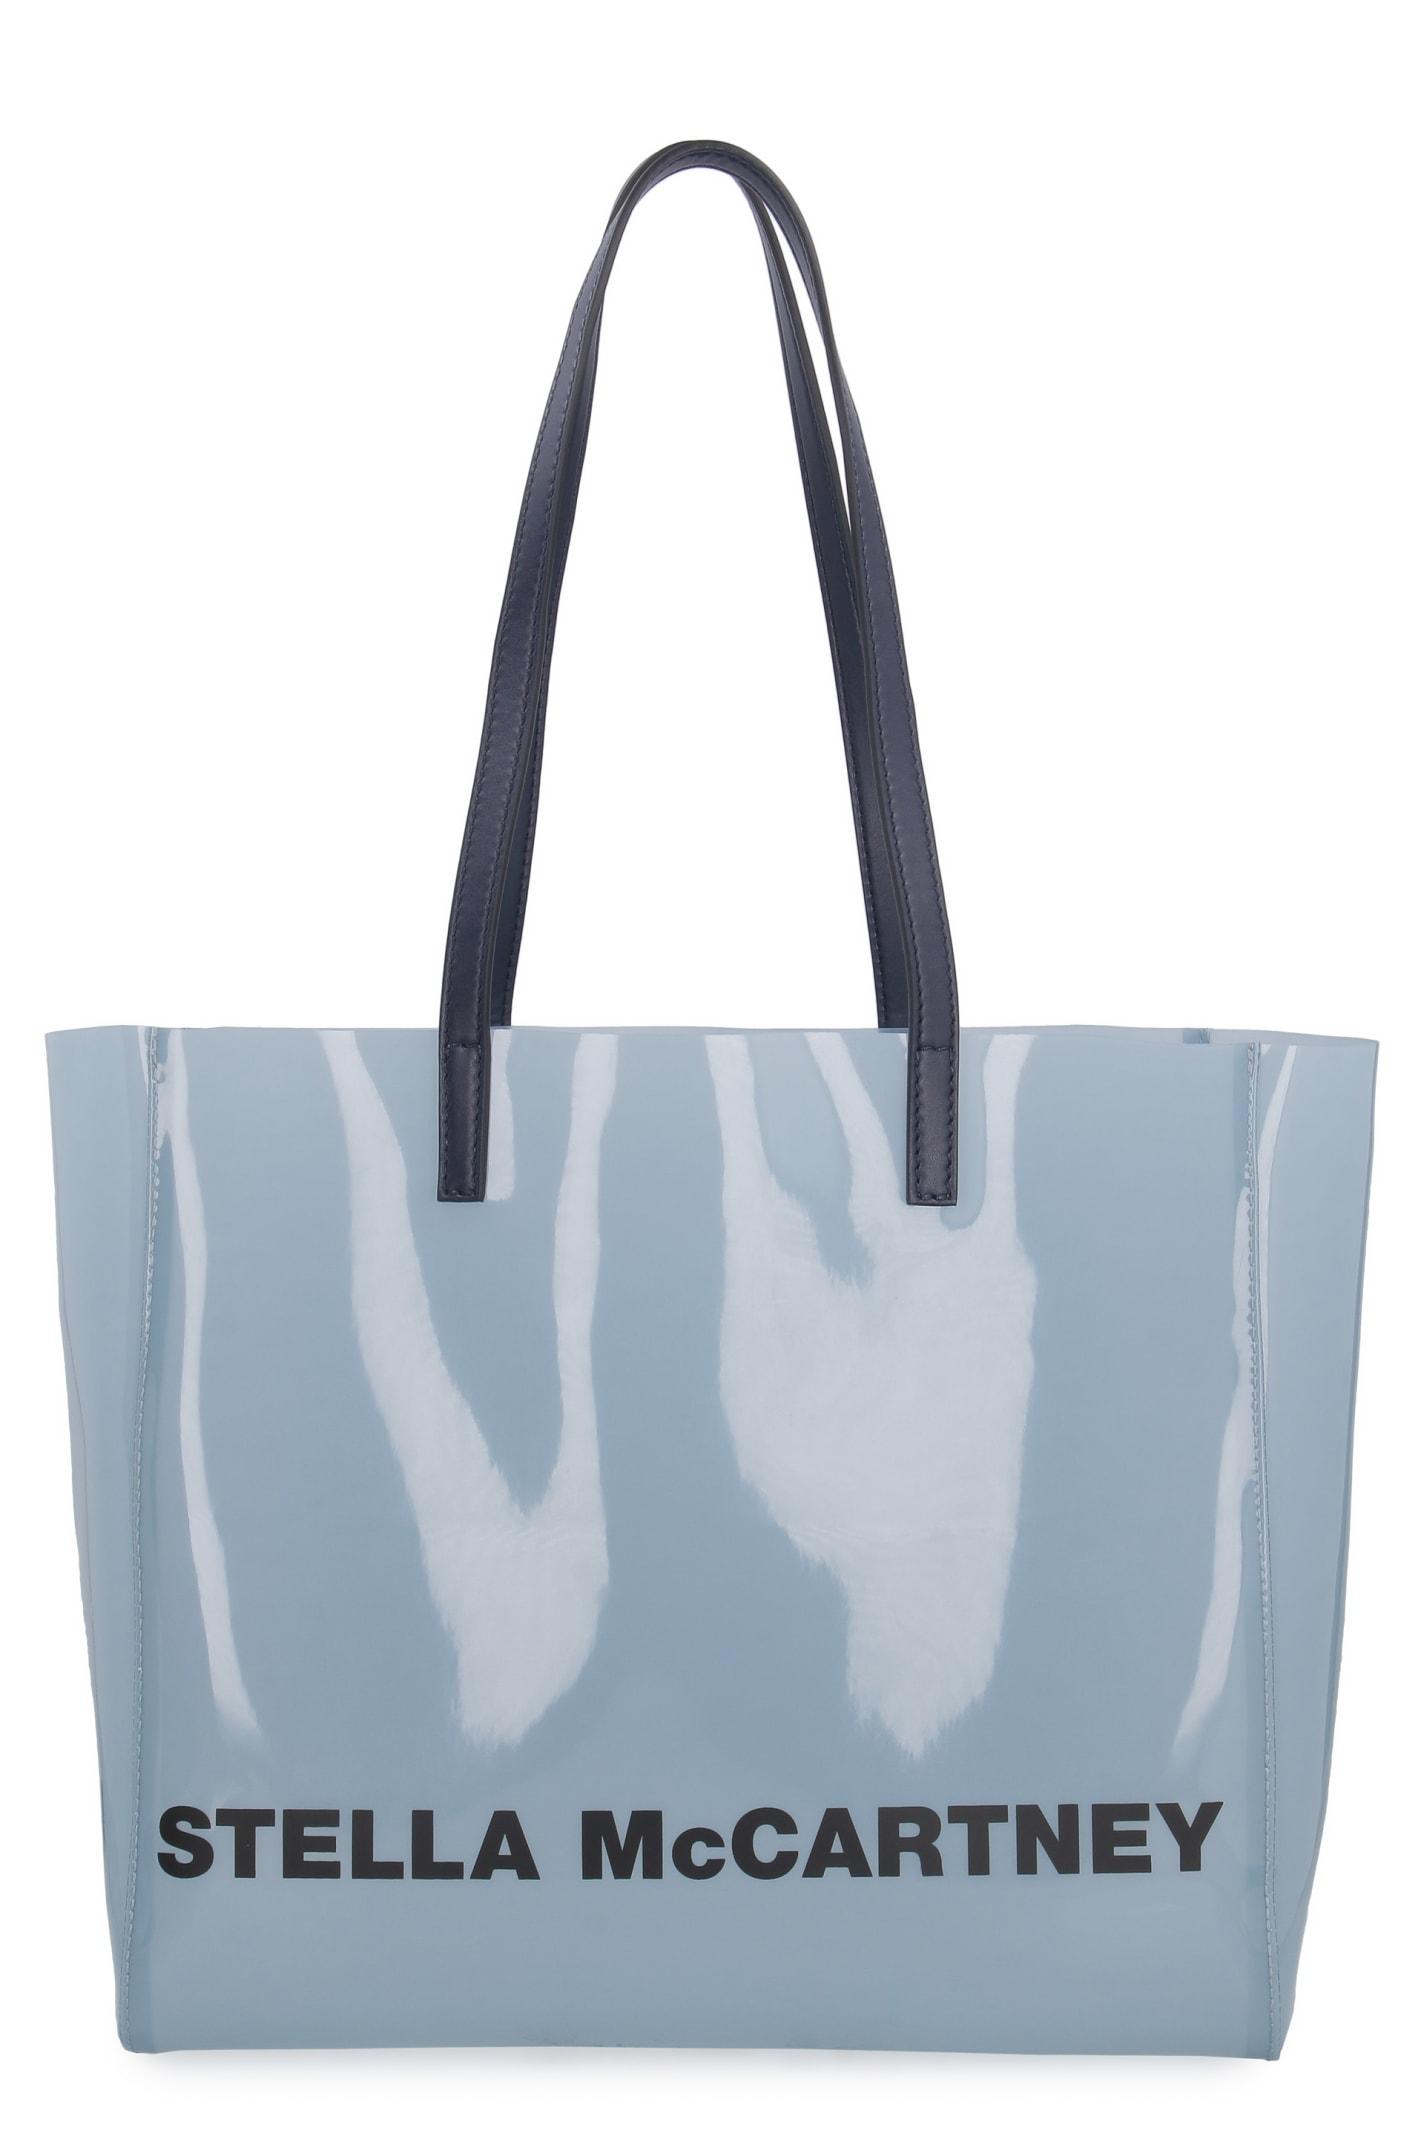 Stella McCartney Stella Mccartney Tote Bag Sale and Offers April 2020